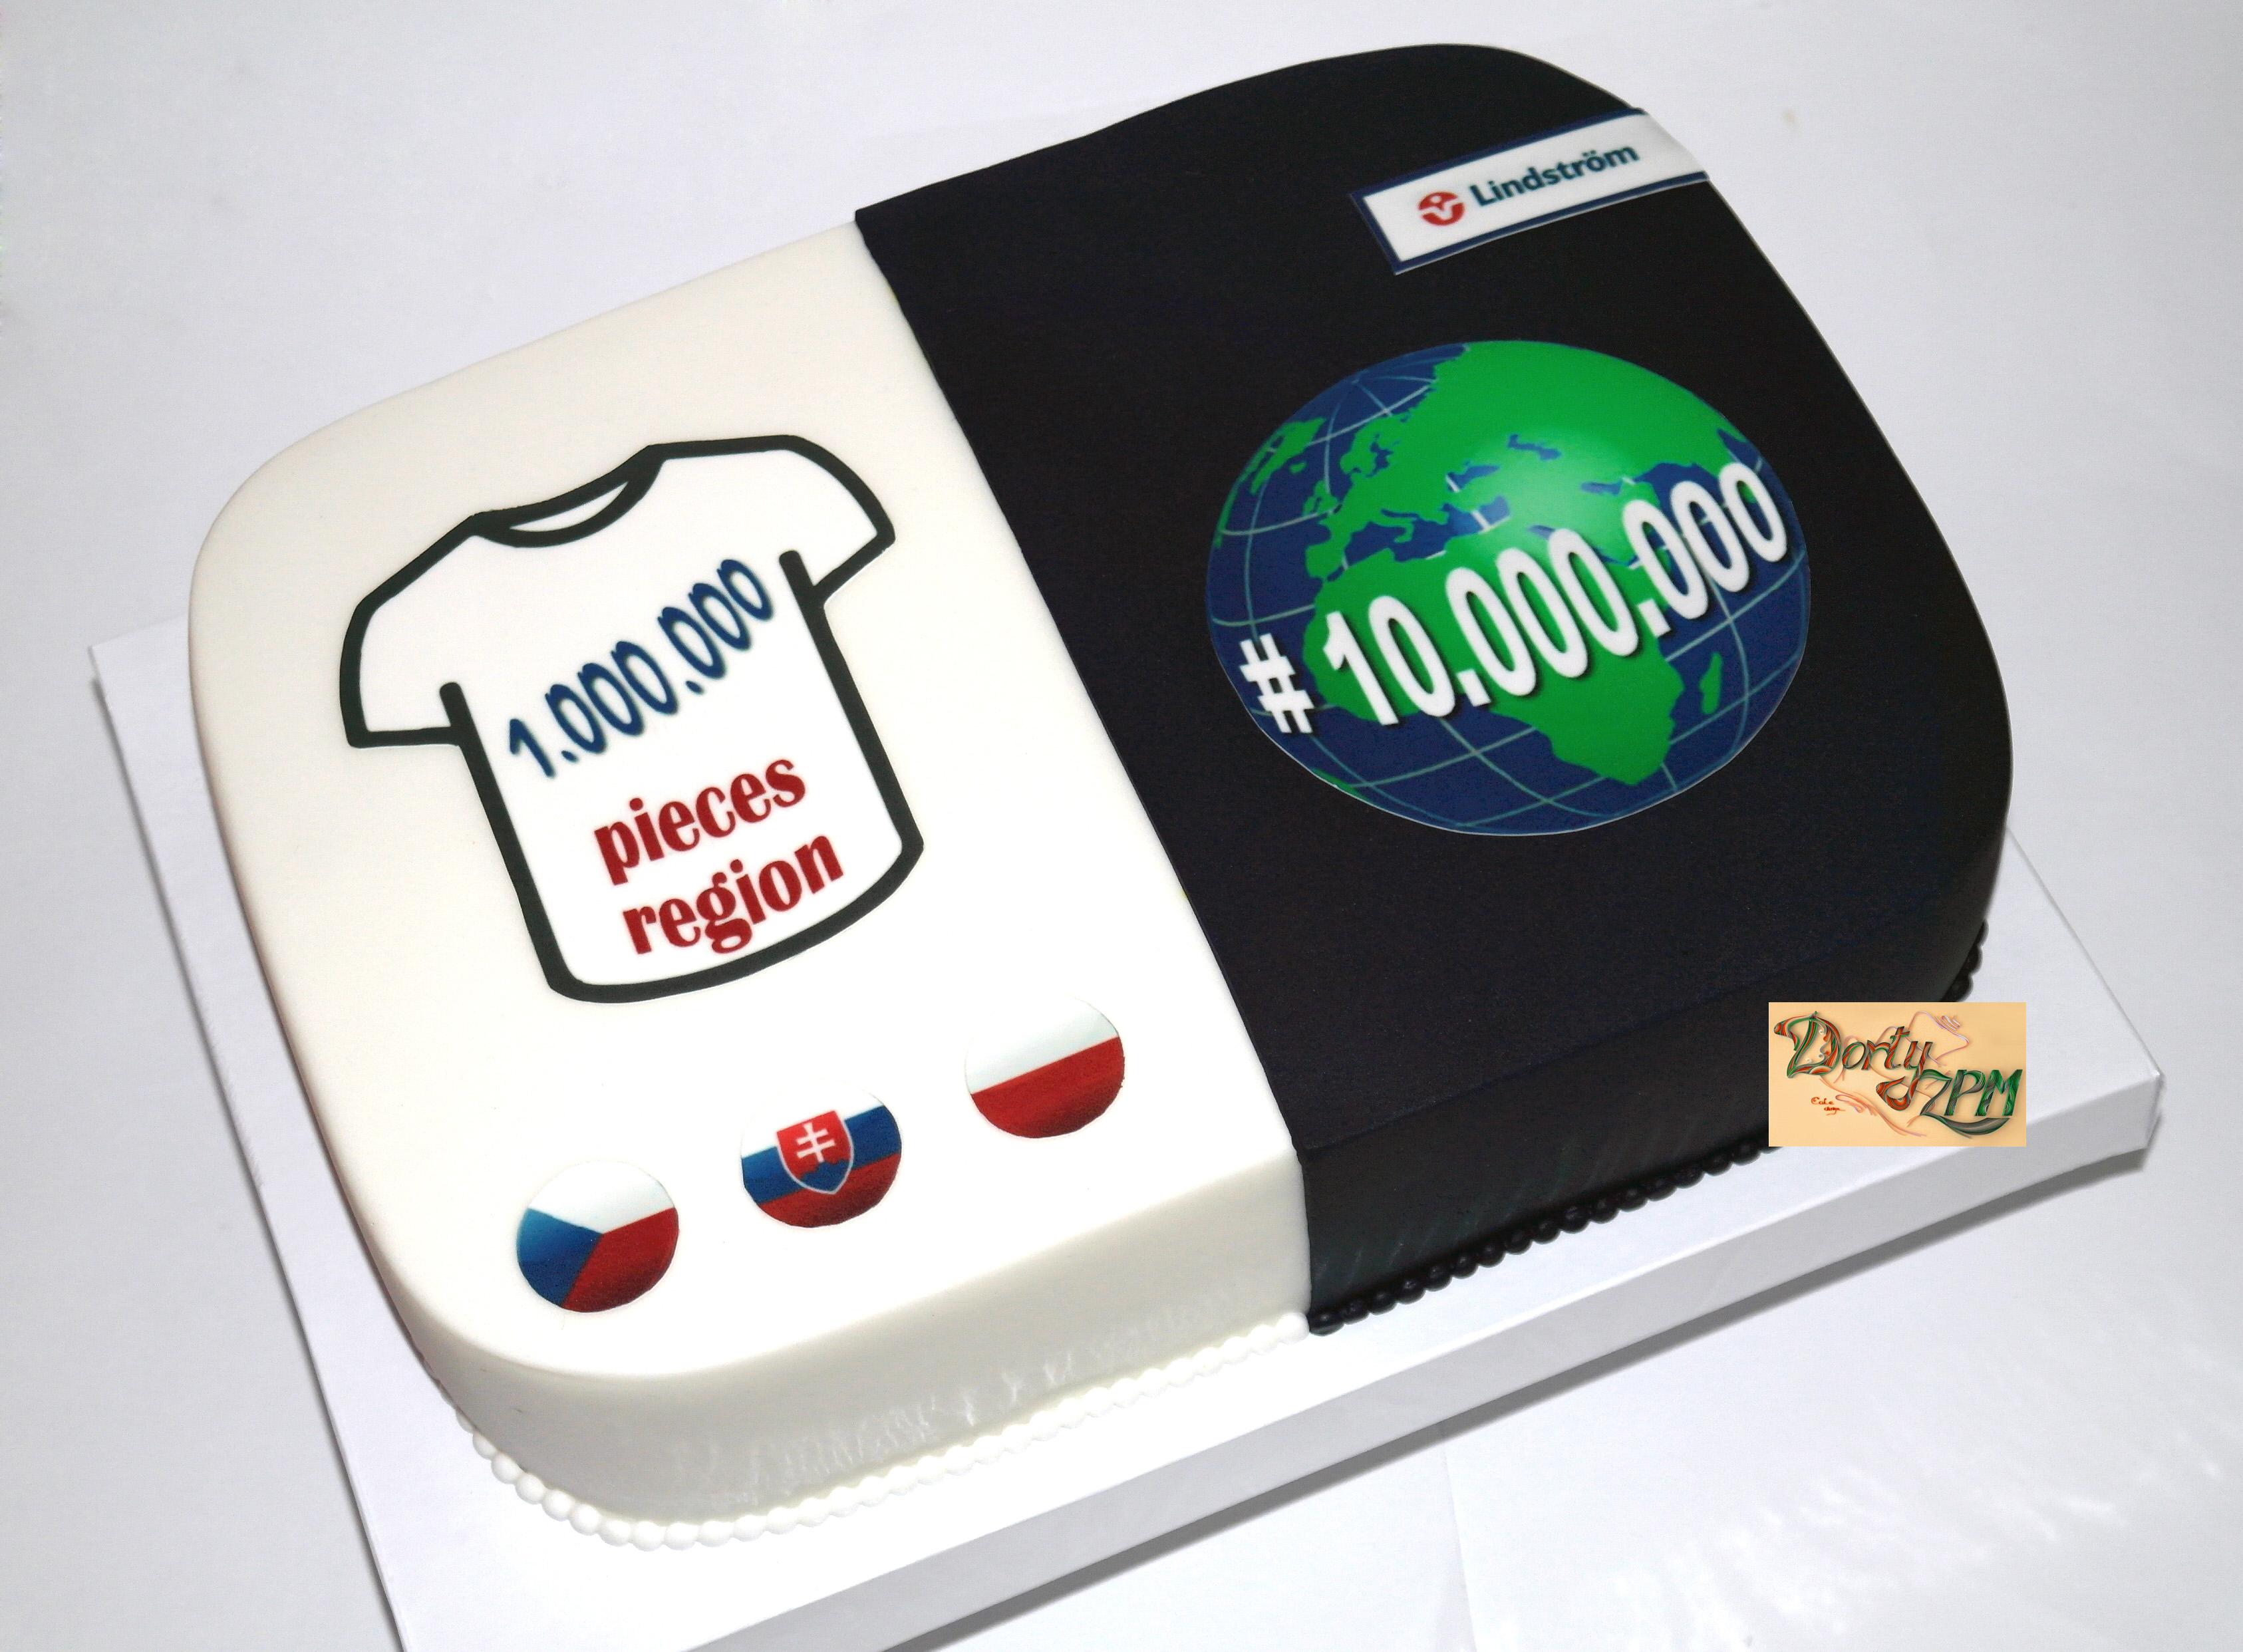 dort, cake, firma, Lindström, výročí